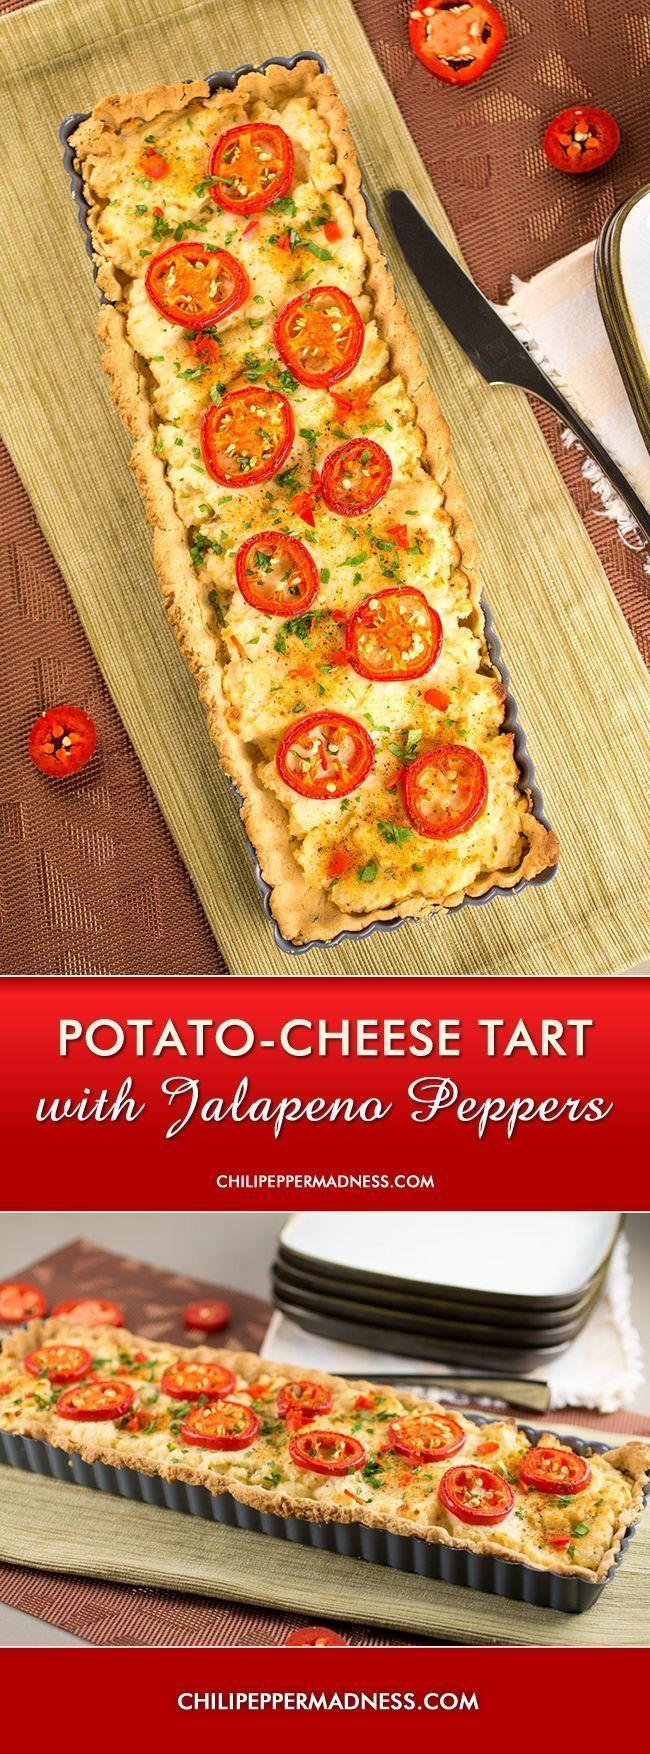 Potato Cheese Tart with Jalapenos